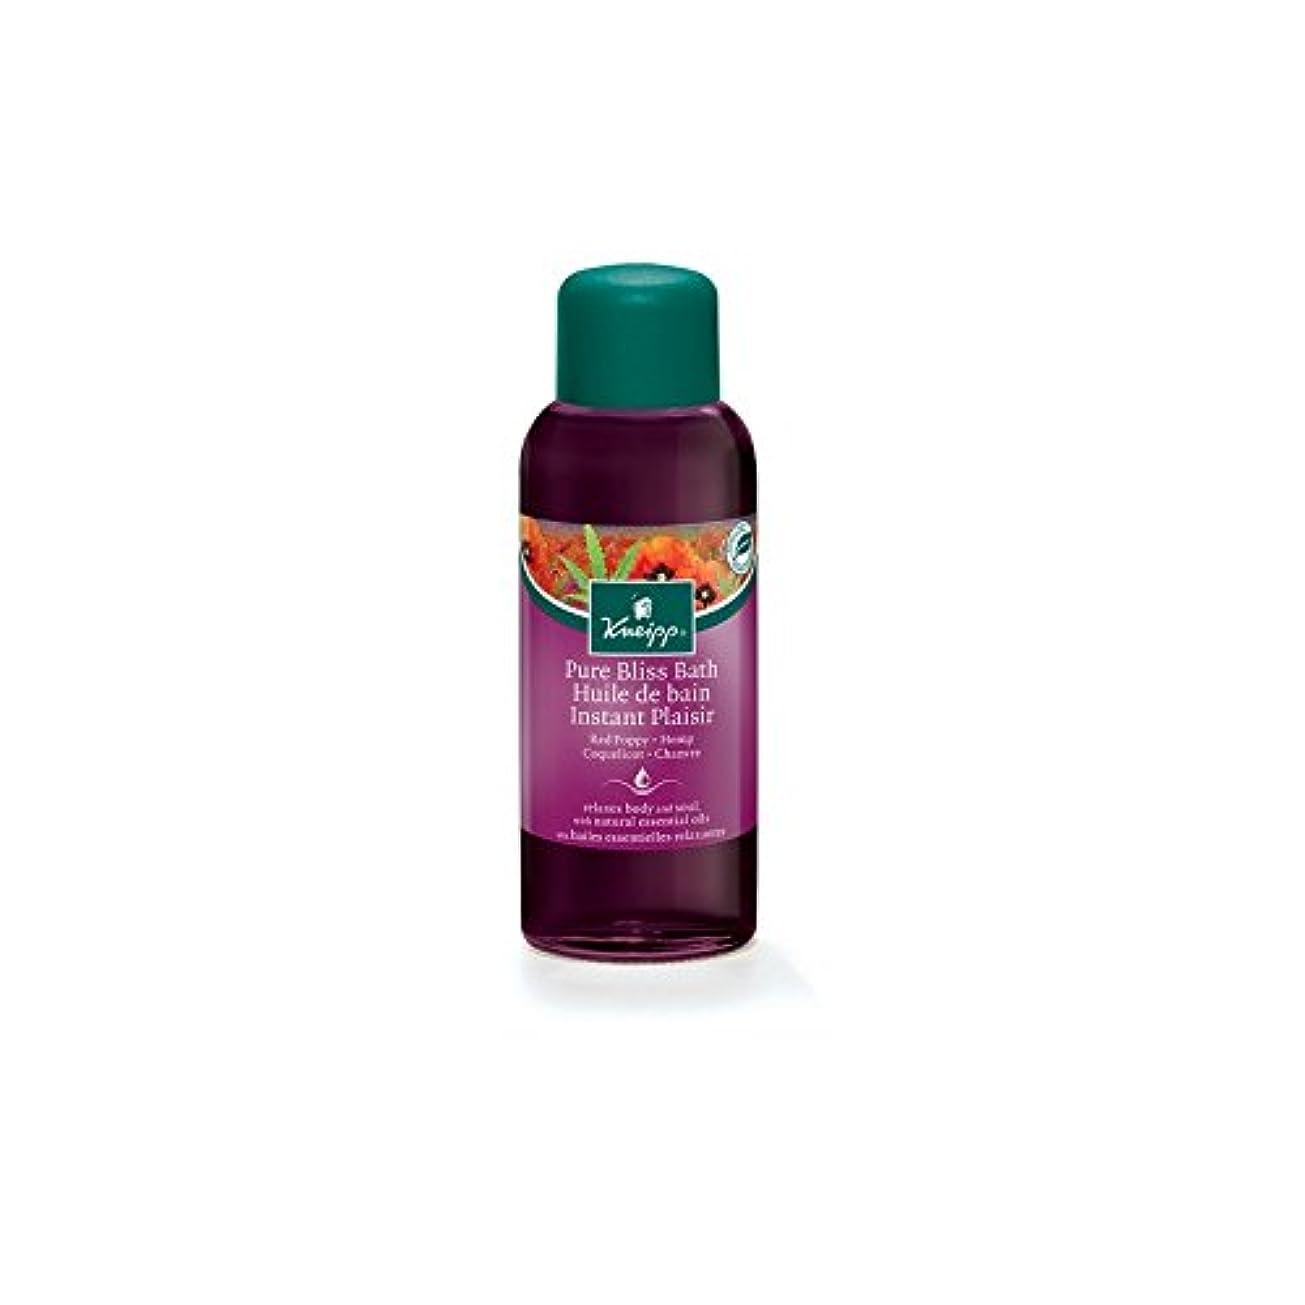 Kneipp Pure Bliss Herbal Red Poppy and Hemp Bath Oil (100ml) - クナイプ純粋な至福ハーブの赤いケシと麻バスオイル(100ミリリットル) [並行輸入品]